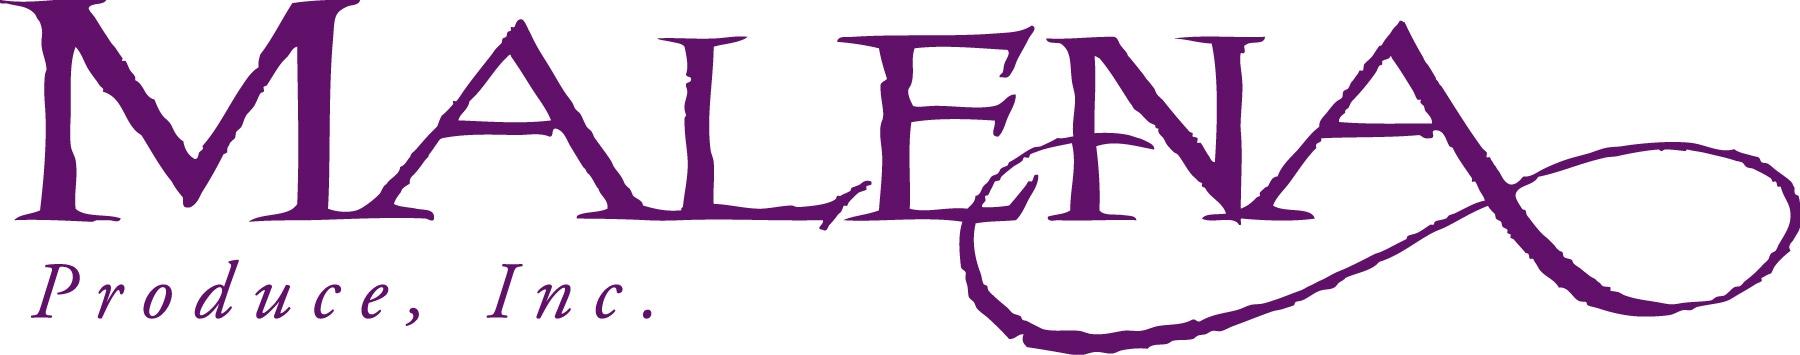 malena-logo3.jpg